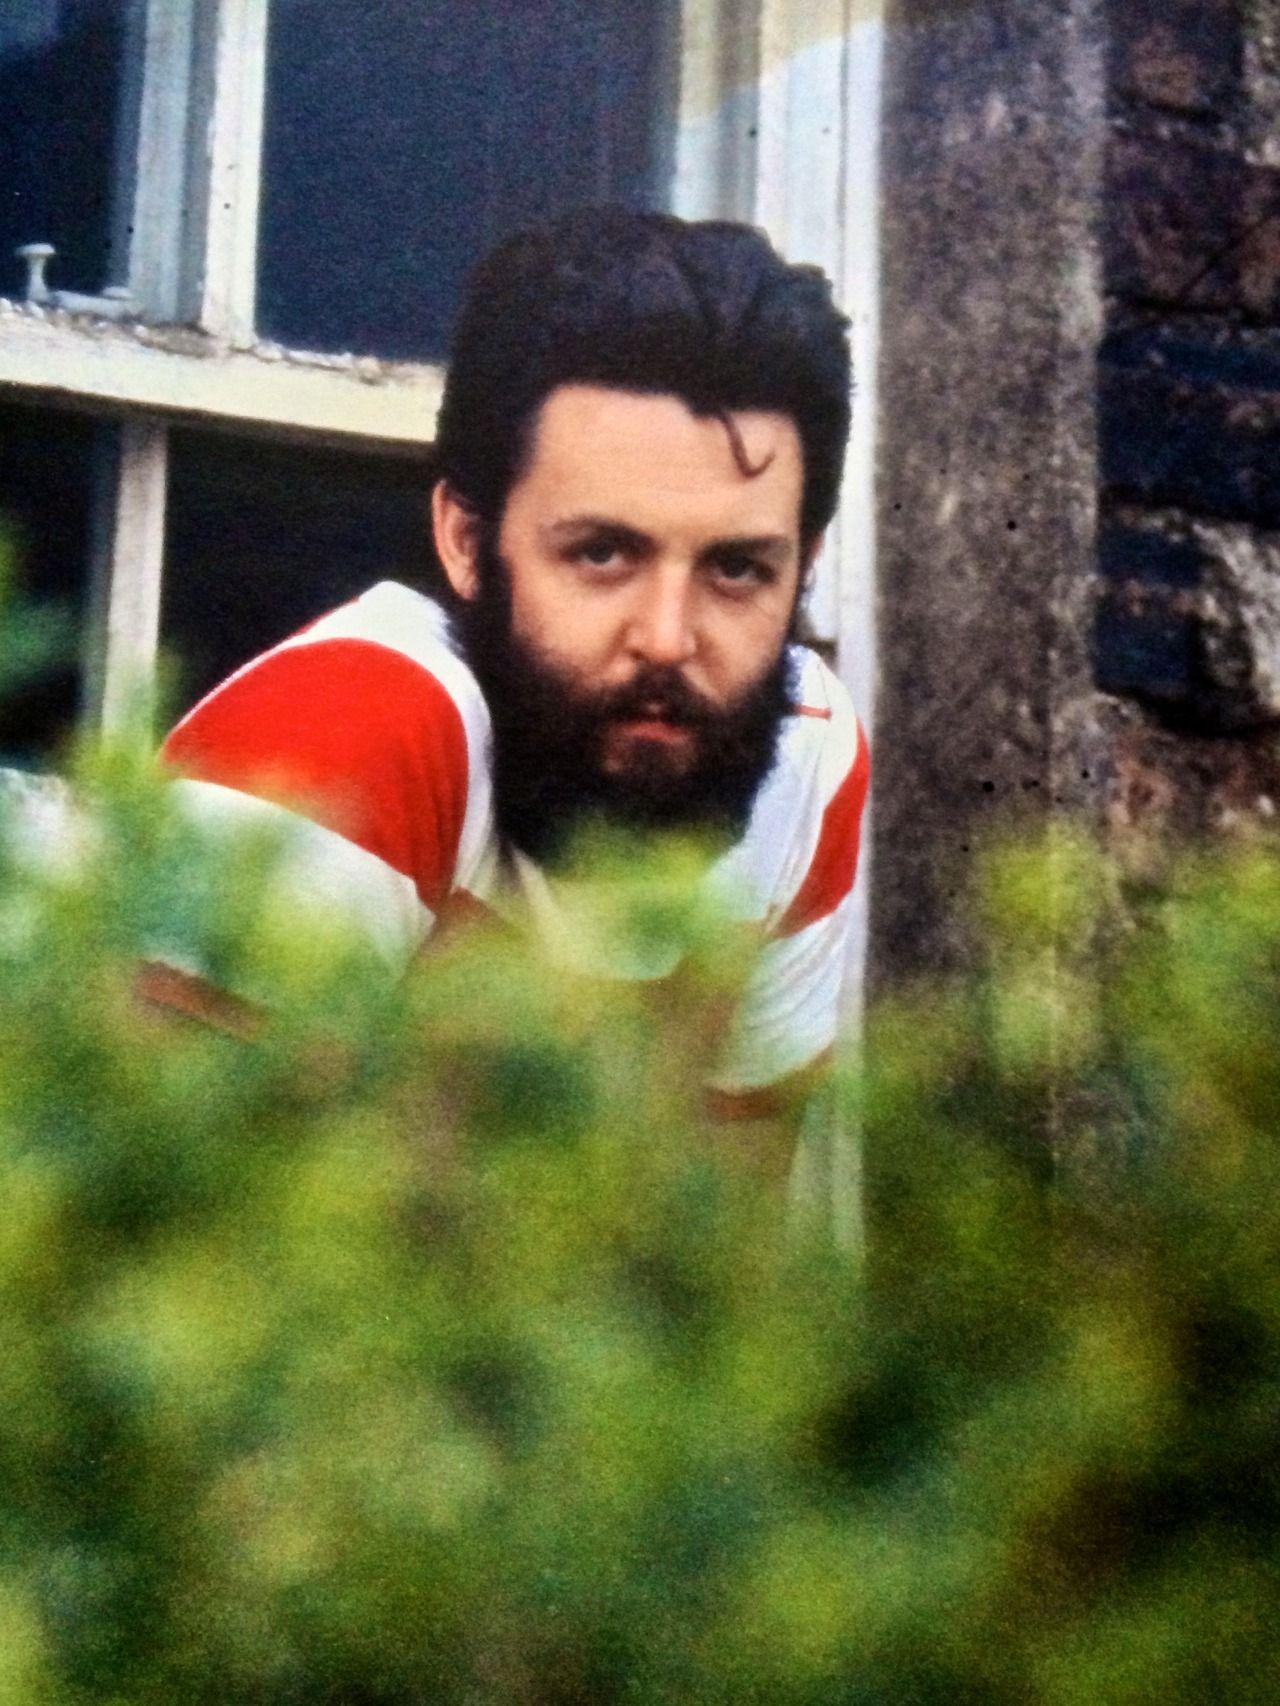 Ringo Starr Paul McCartney Scotland 1970 Photograph By Linda